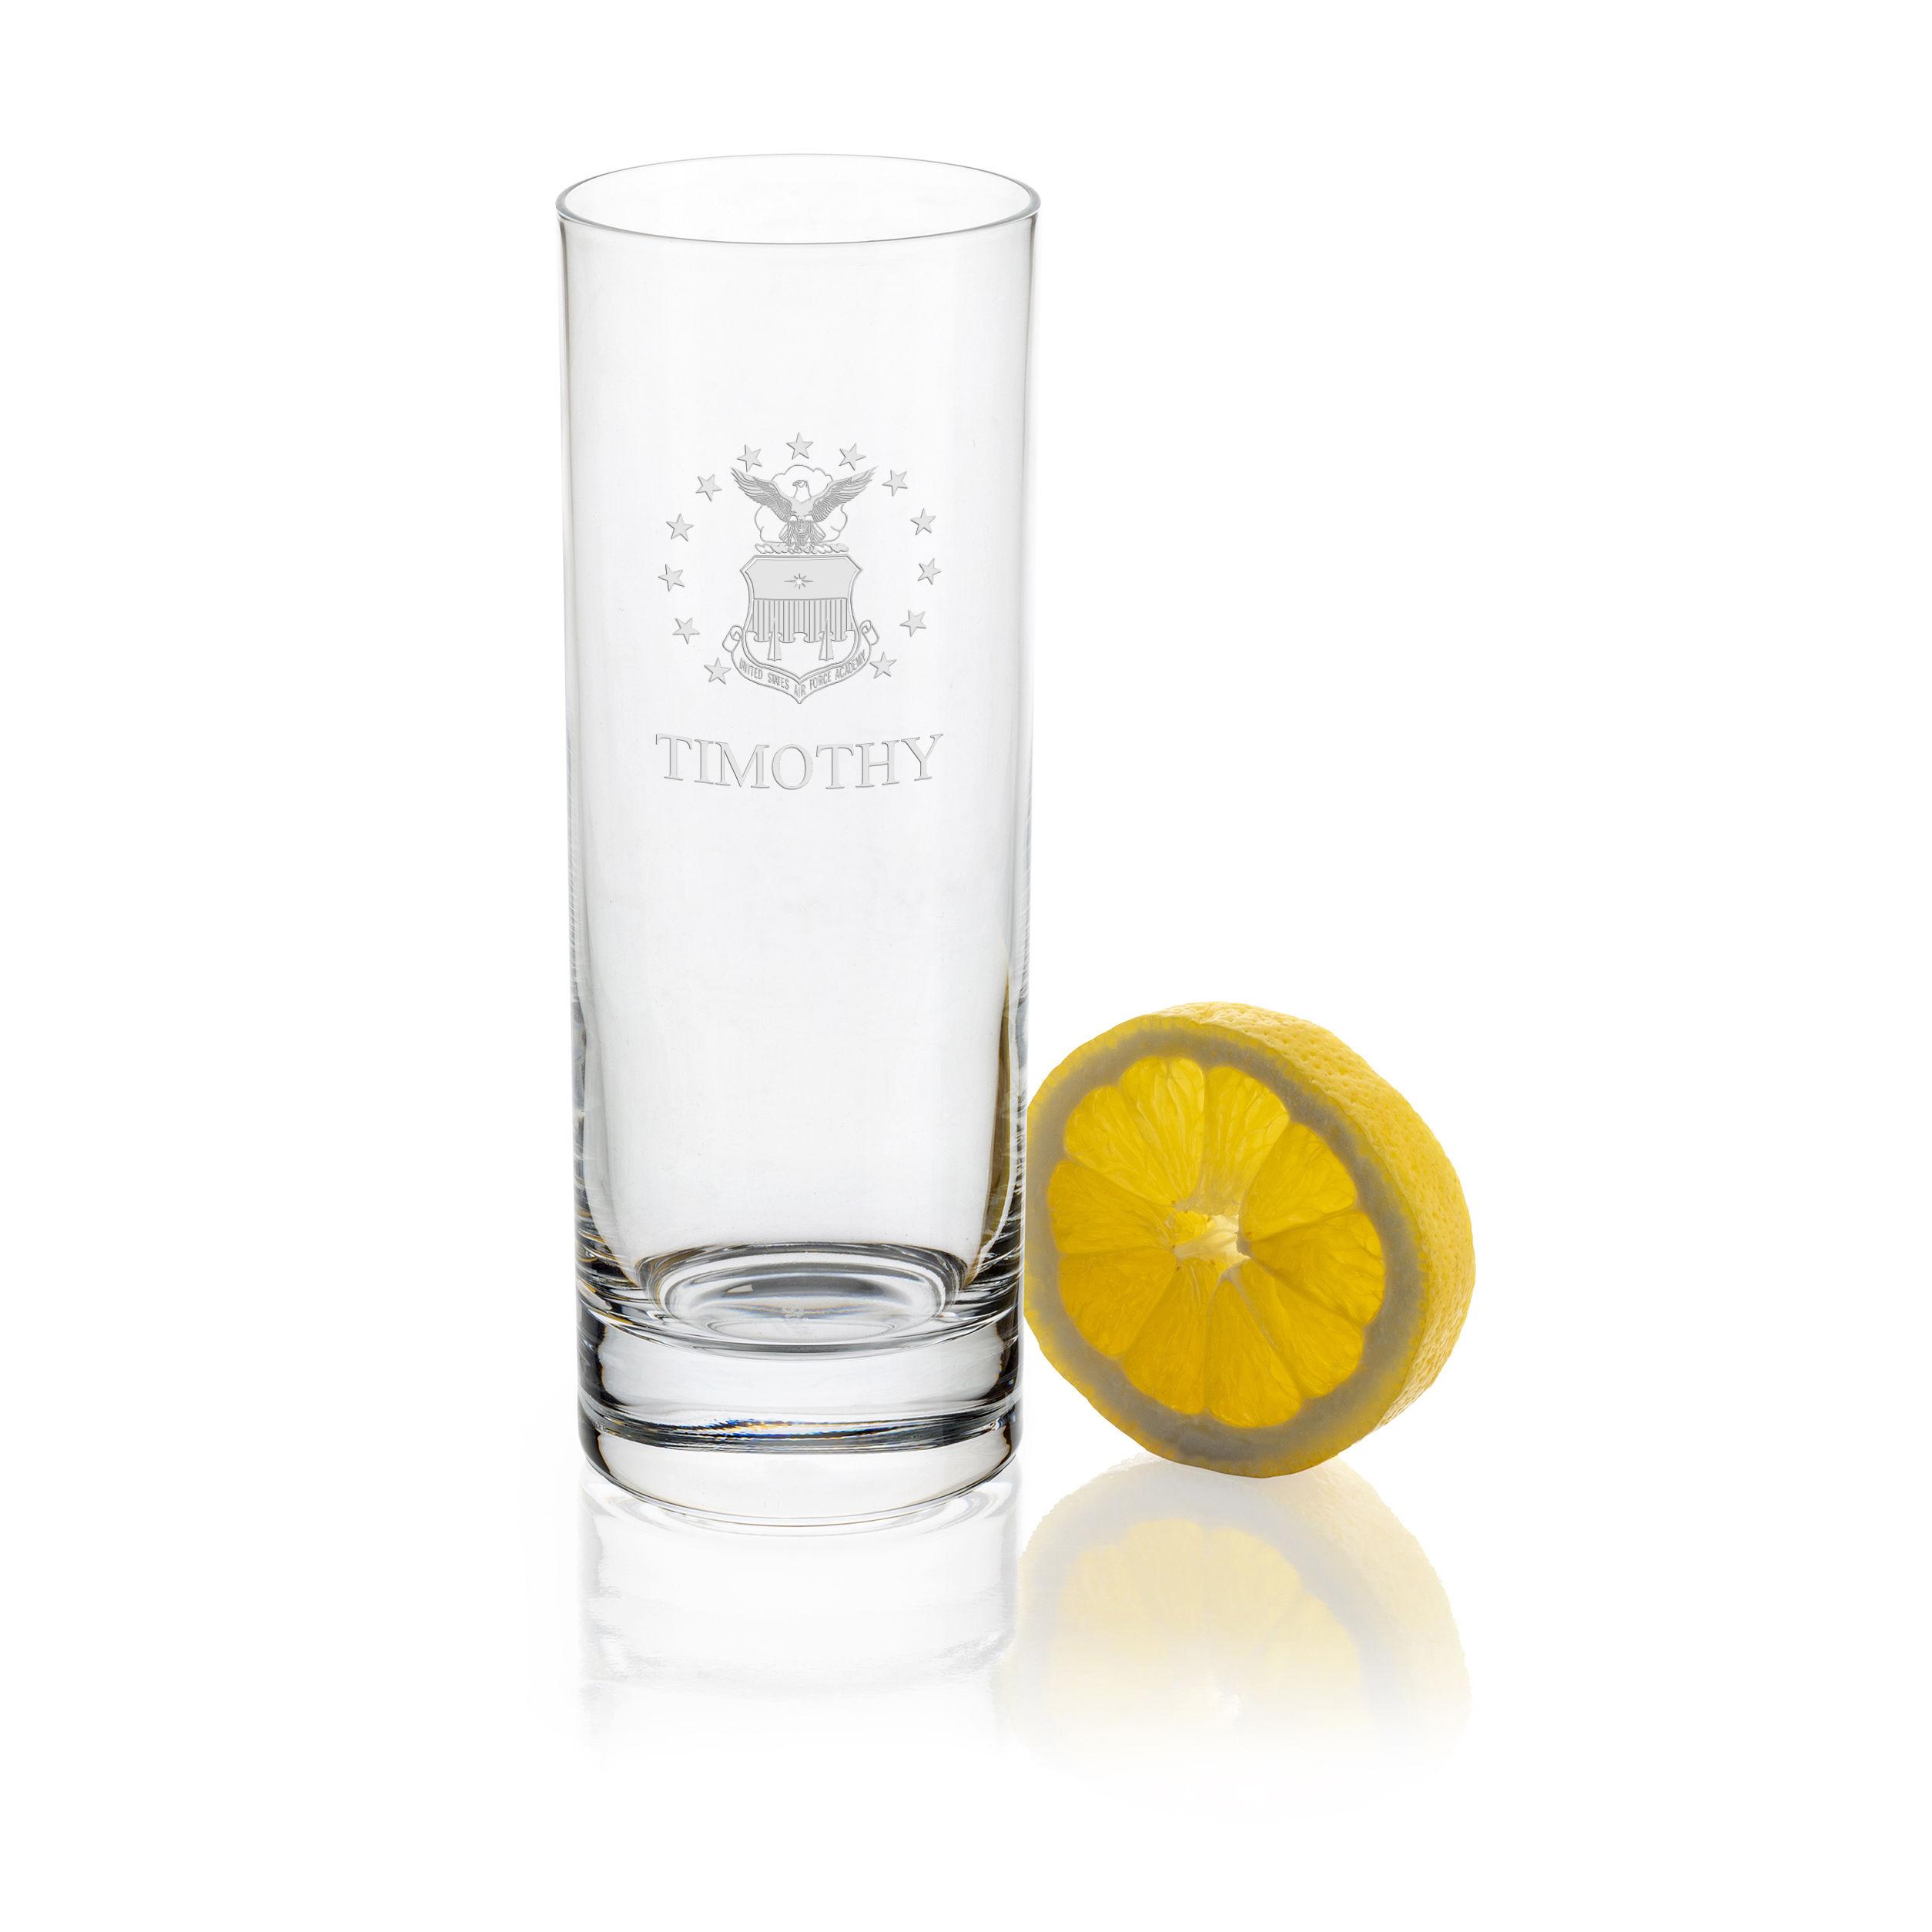 USAFA Iced Beverage Glasses - Set of 2